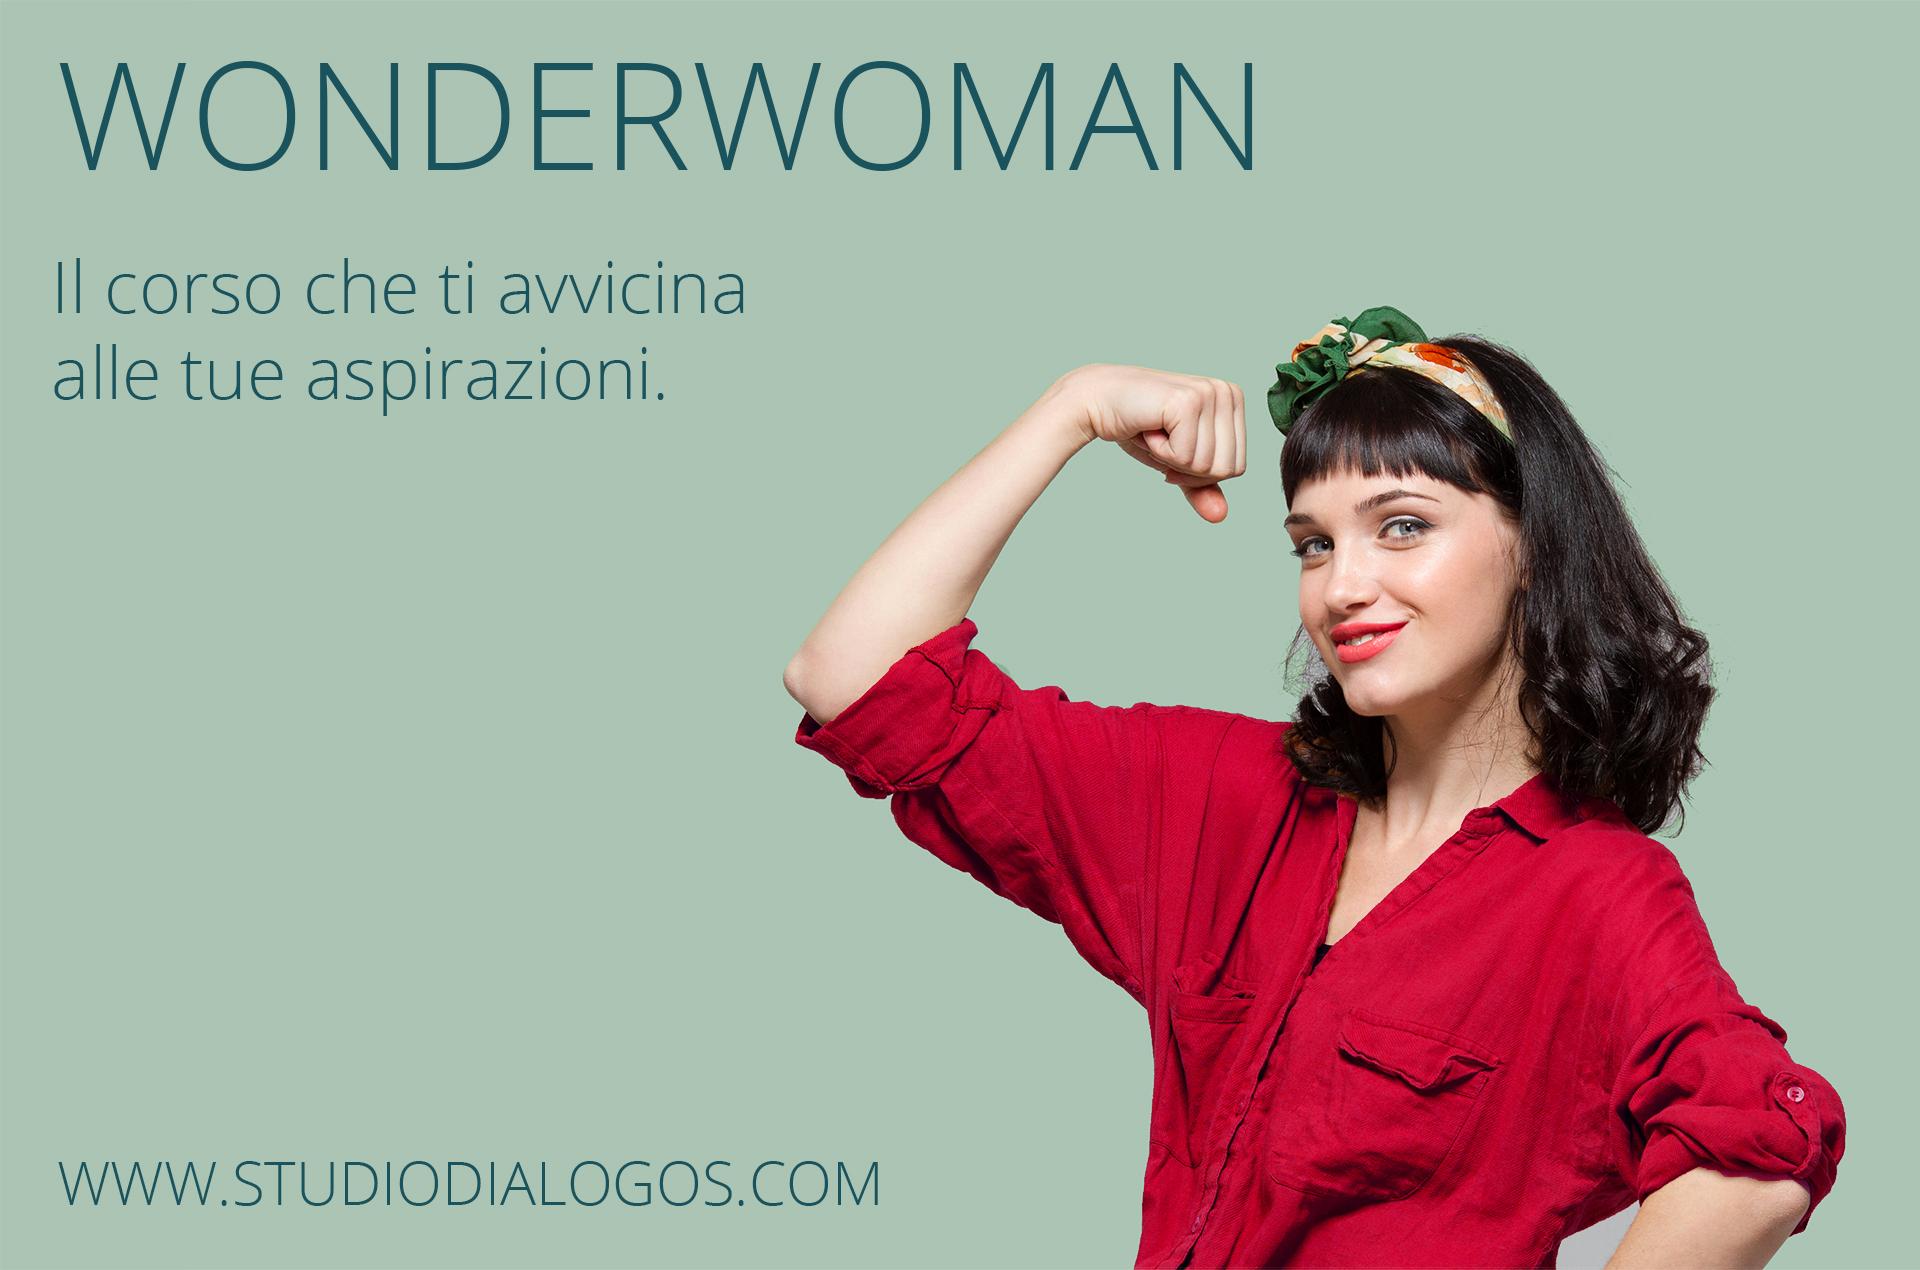 Wonderwoman Dialogos